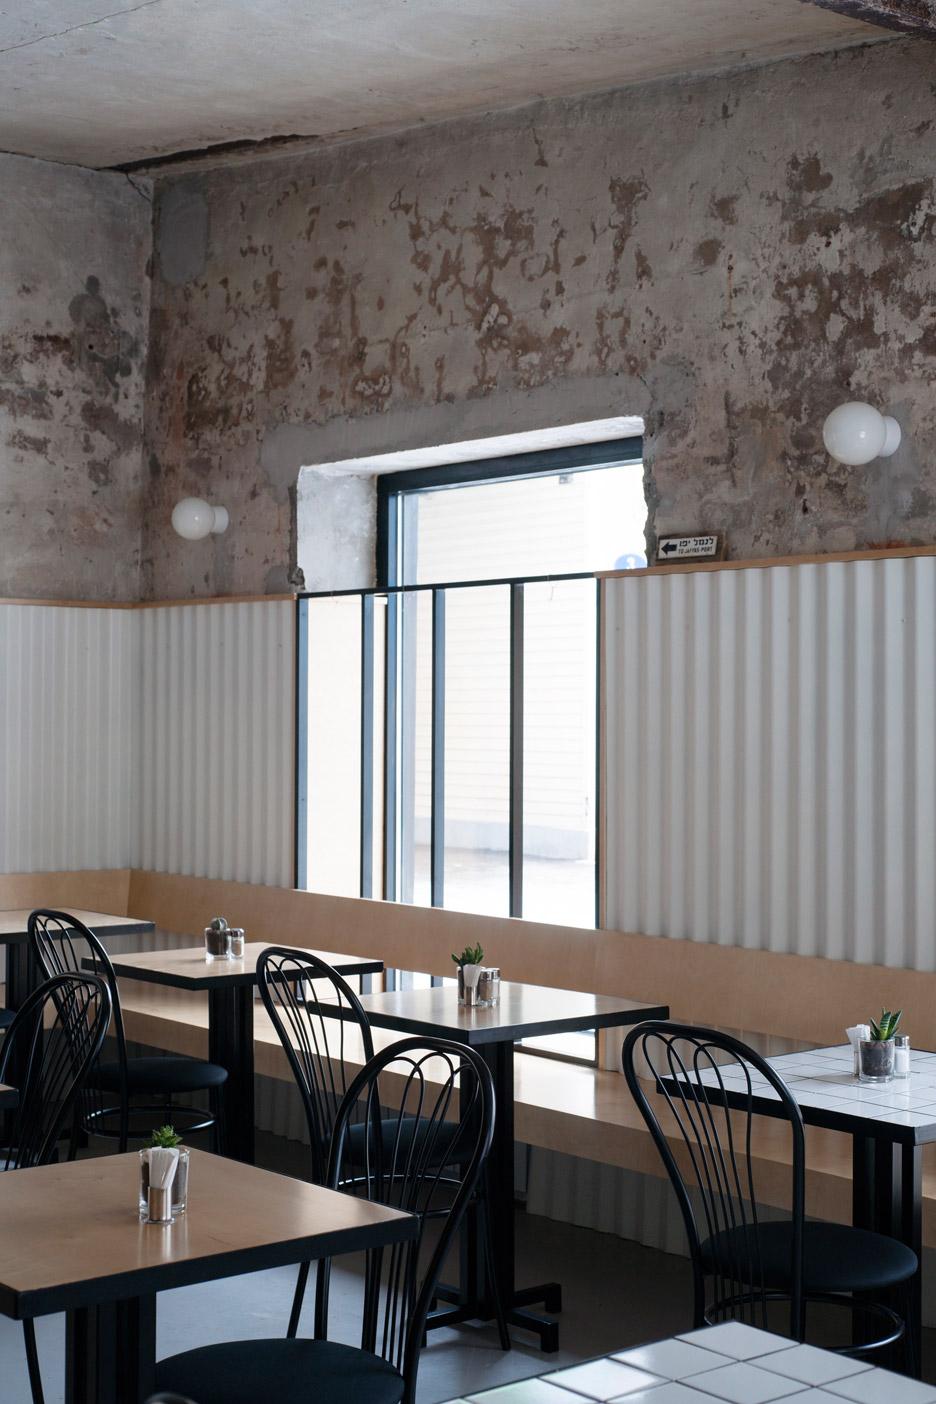 dizengof-99-crosby-studios-moscow-restaurant-interior-_dezeen_936_9.jpg